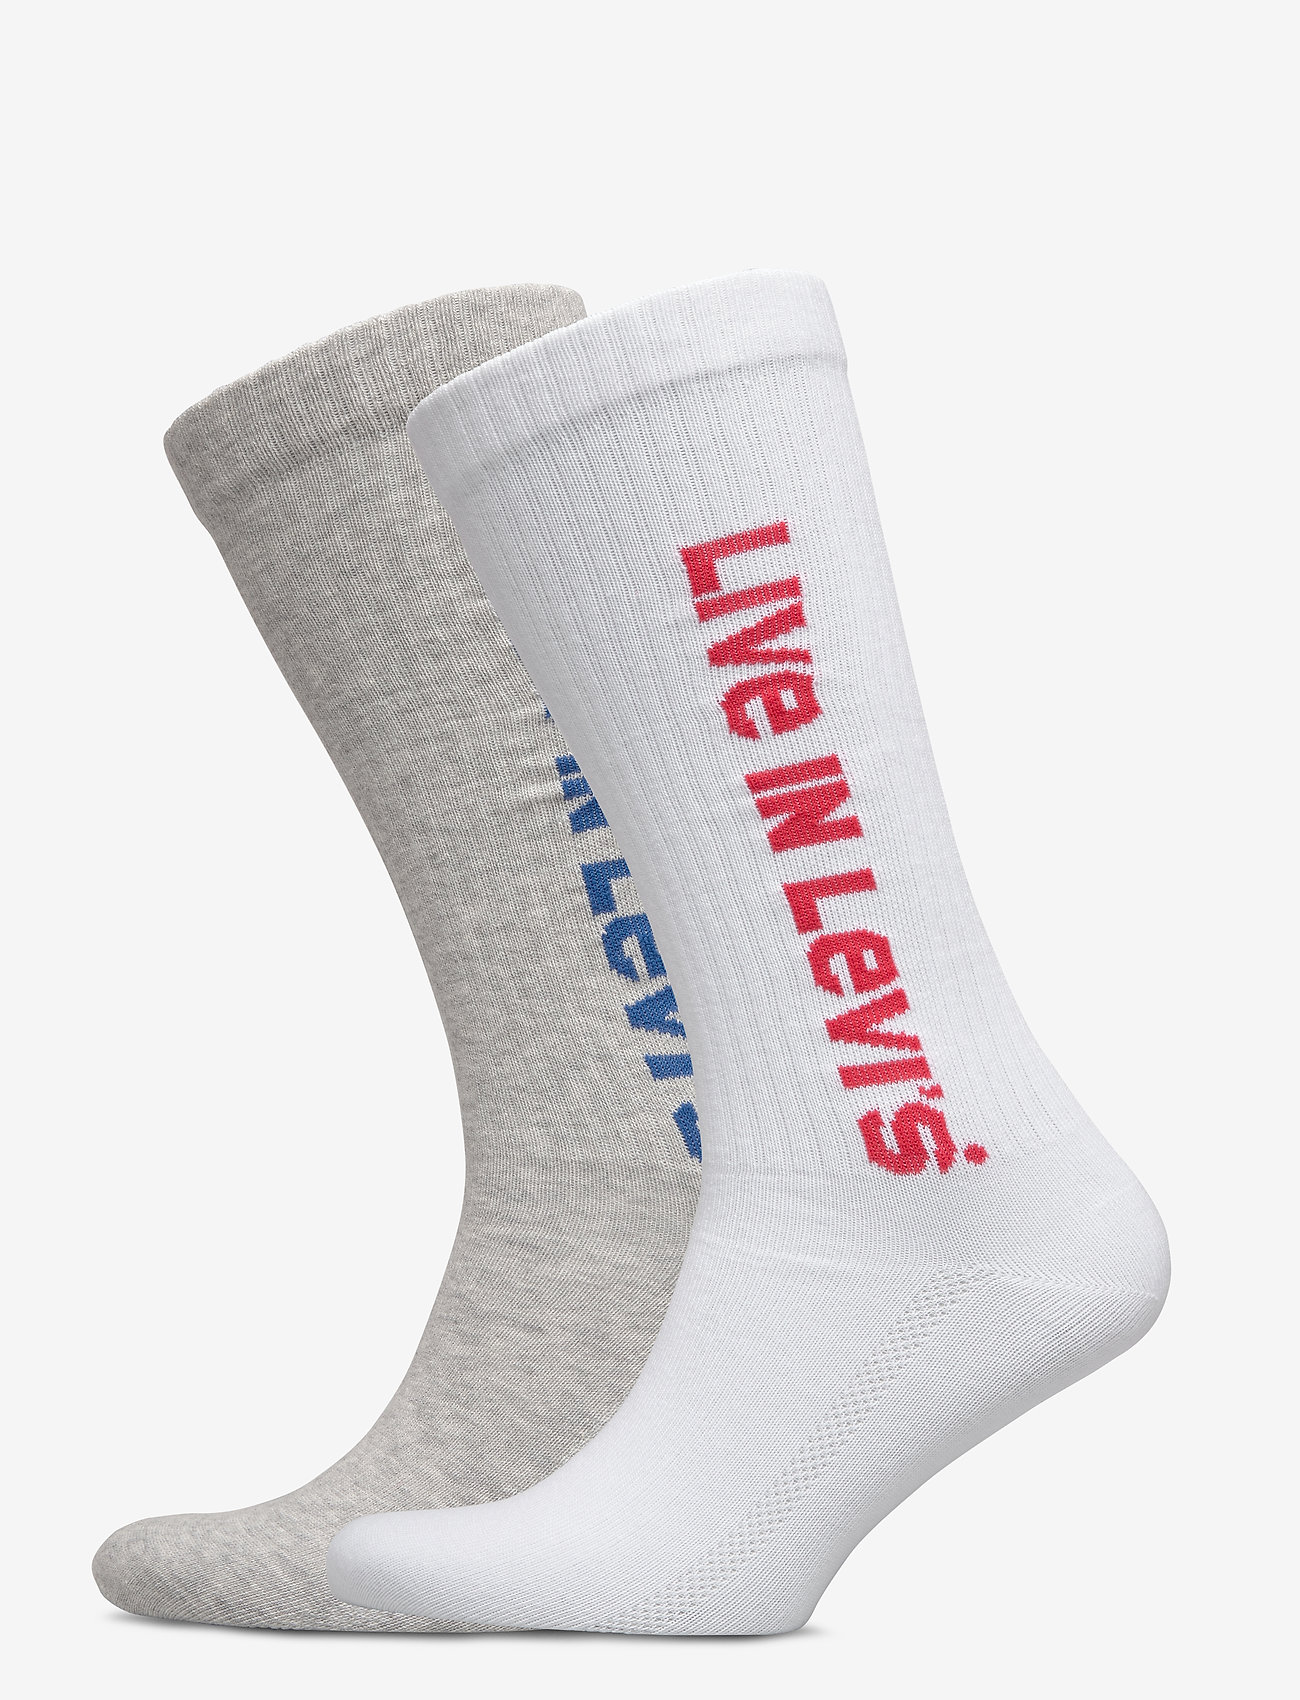 Levi´s - LEVIS VINTAGE CUT SPRT SOCK UNISEX - sokker - grey / grey - 0